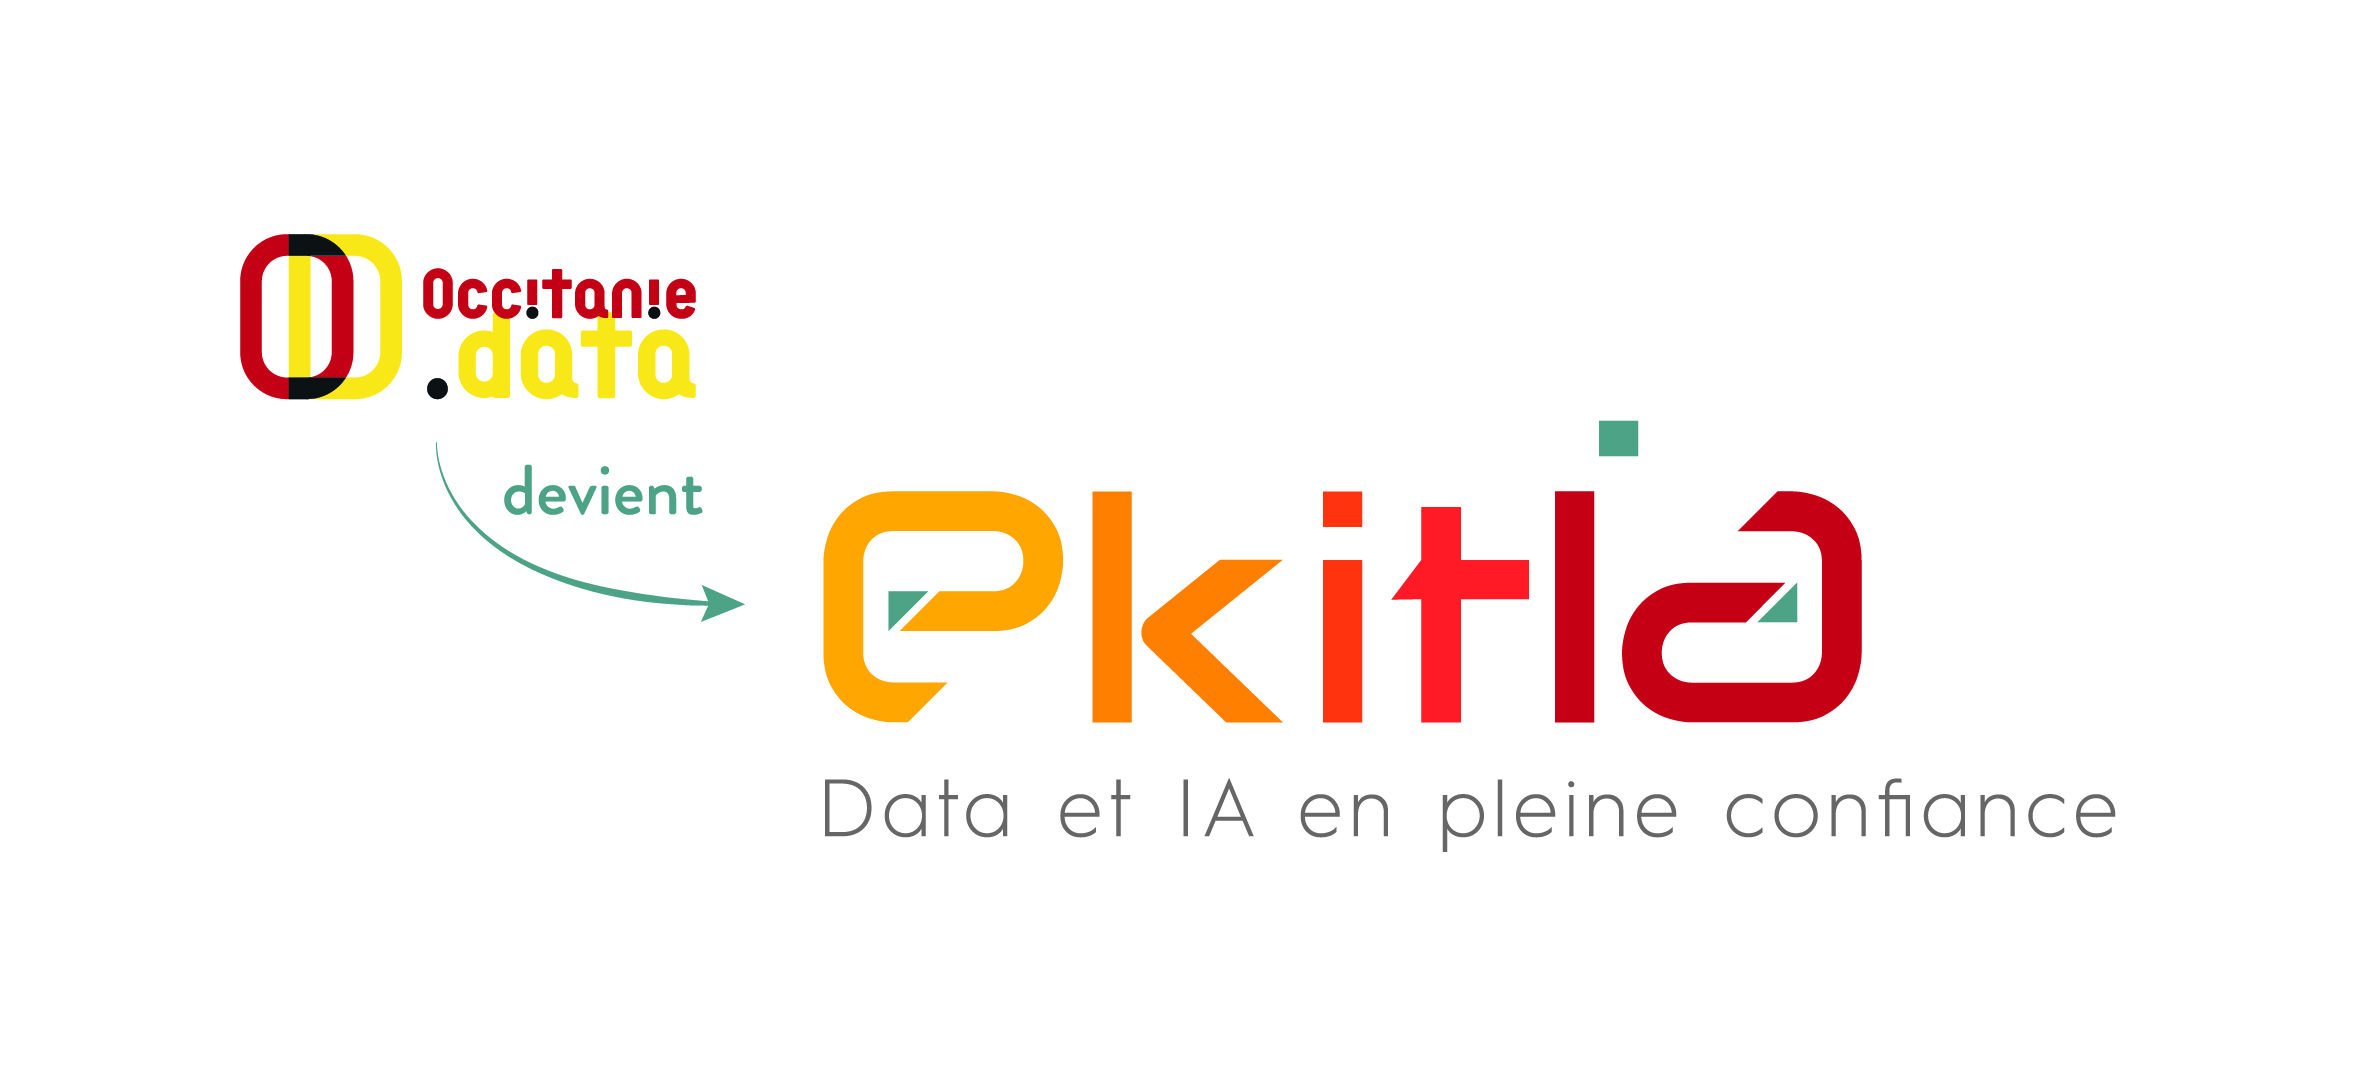 Occitanie Data